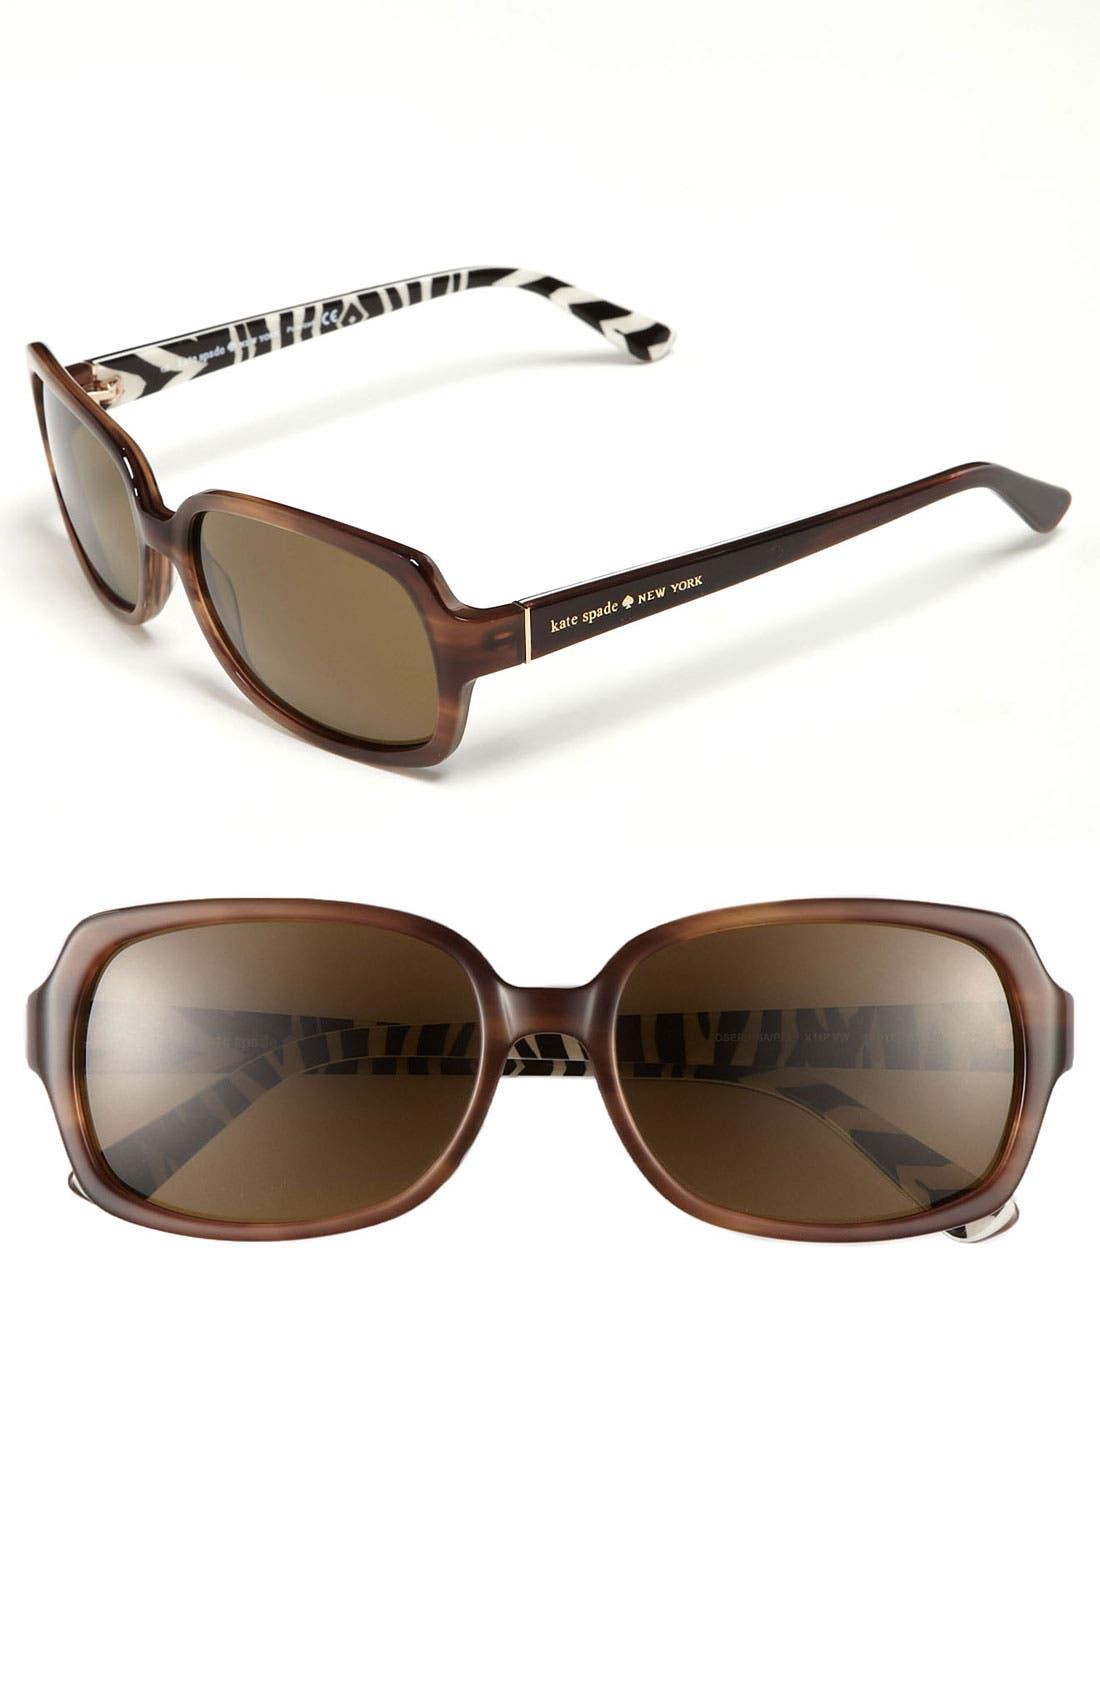 Alternate Image 1 Selected - kate spade new york 'josephina' 56mm polarized sunglasses